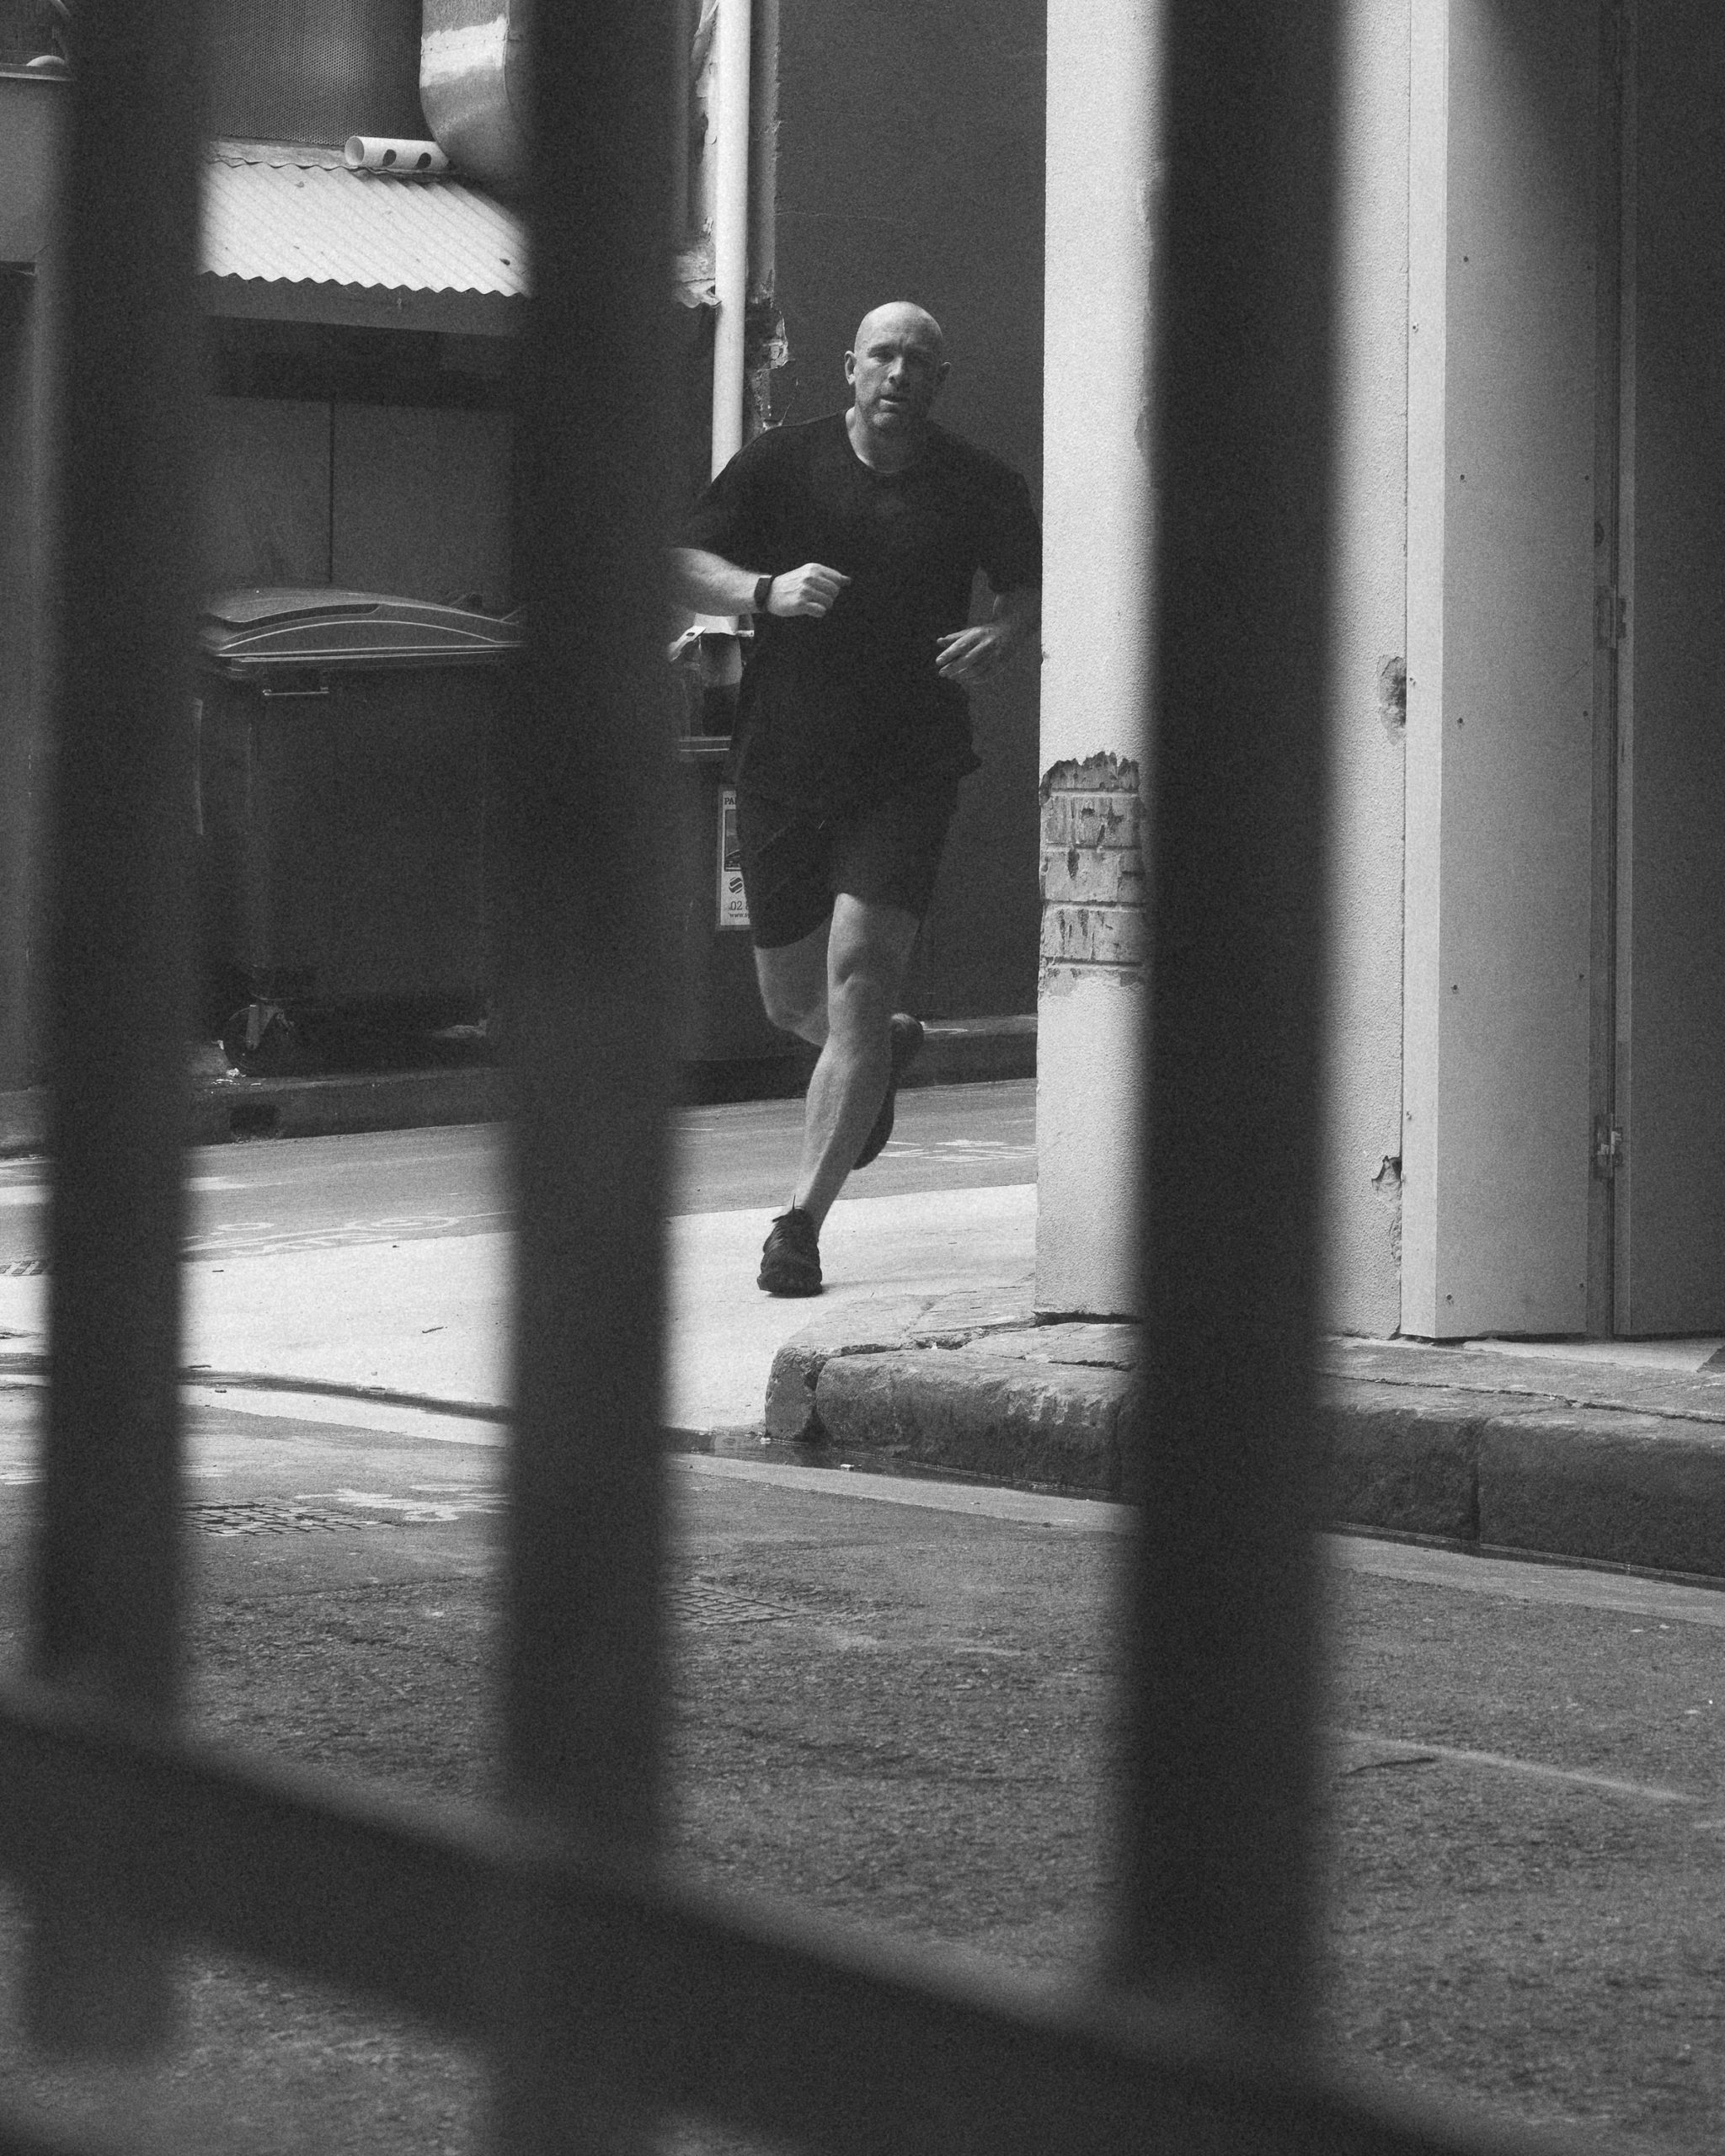 Workout in Lockdown